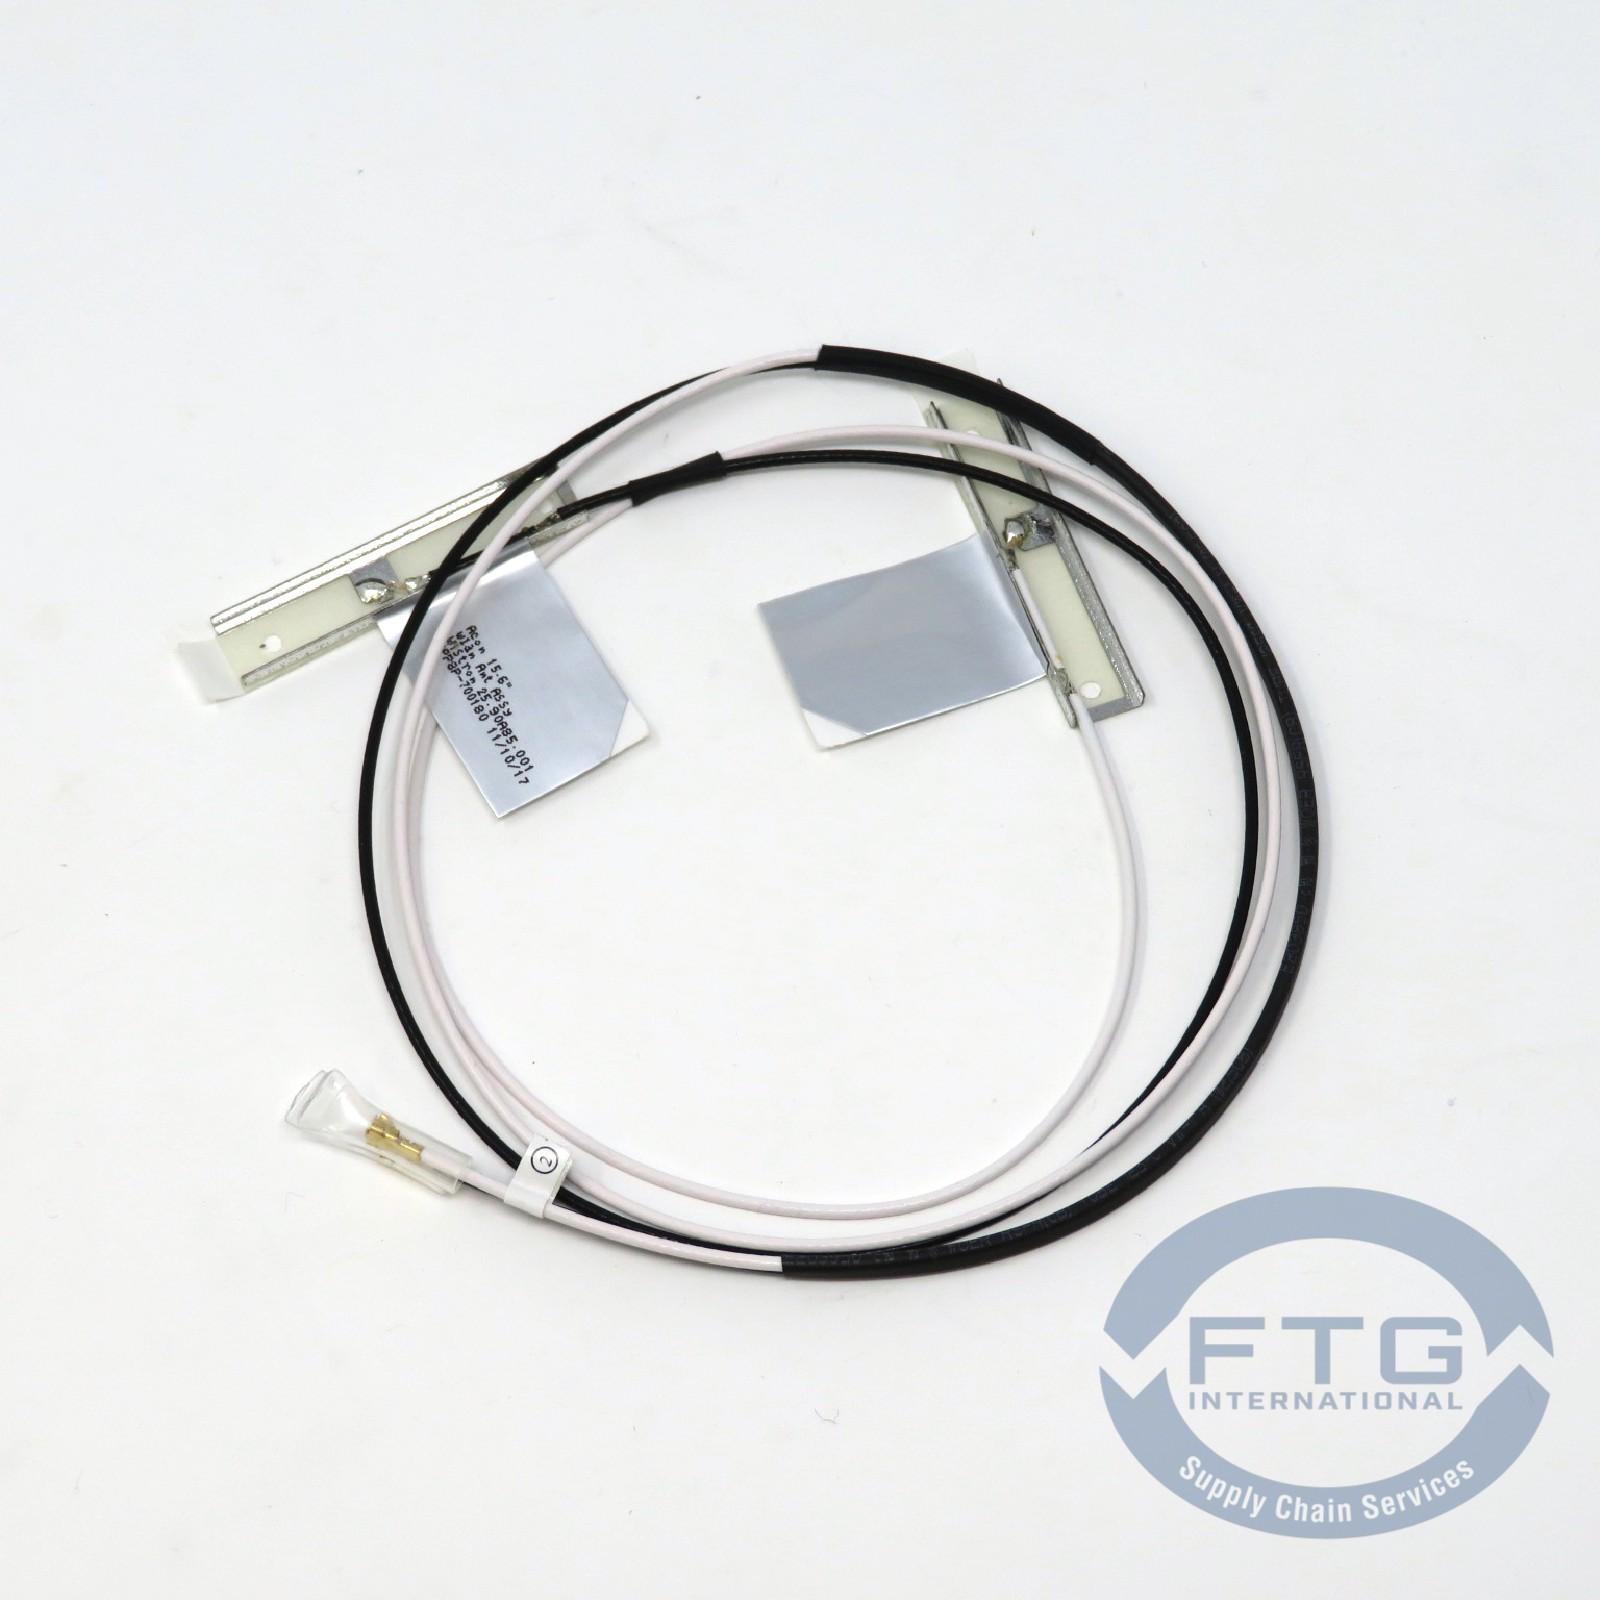 FTG International 614759-001 Antenna WLAN 459MM 1.13MM